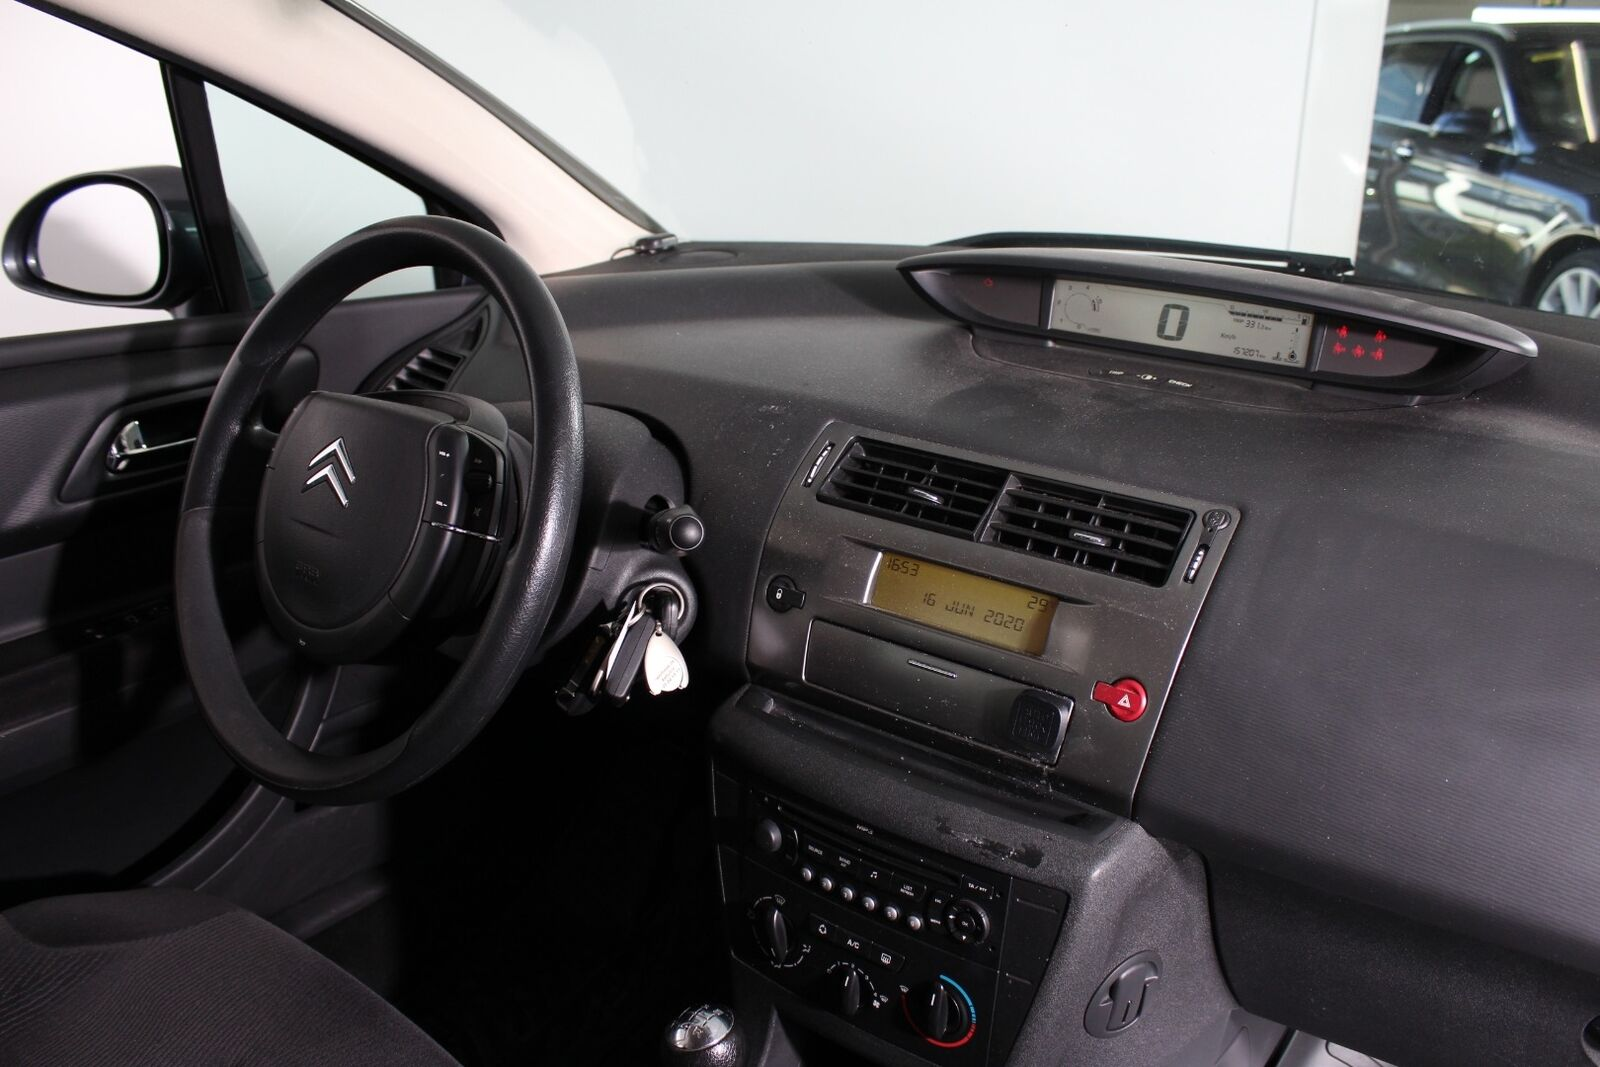 Citroën C4 1,6 HDi 110 SX